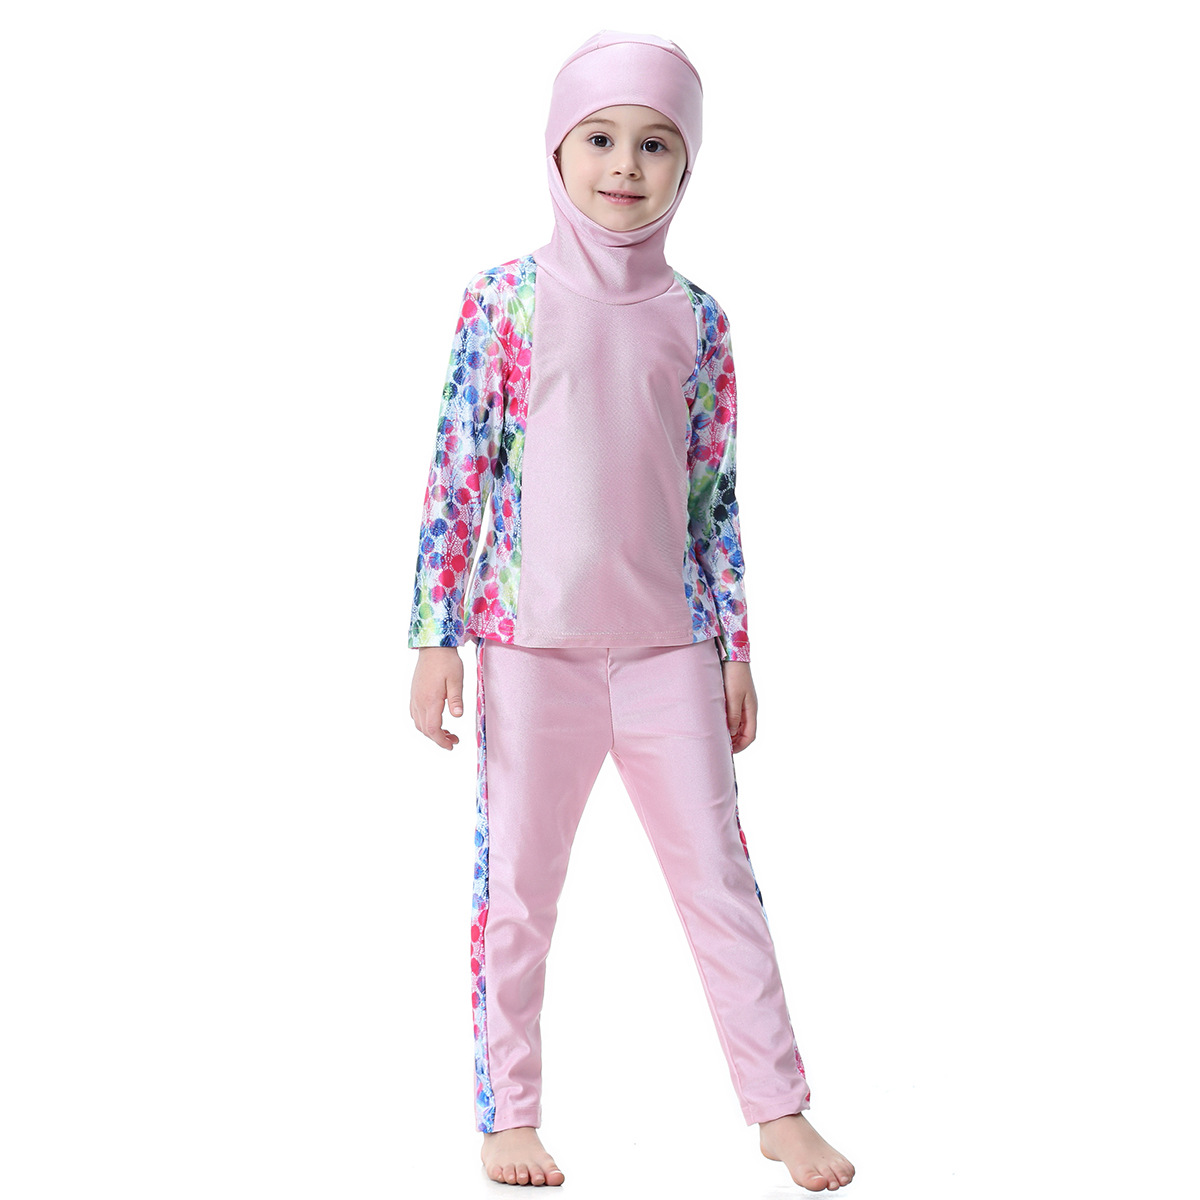 fashion Girls Full Coverage Swimwear 2 pieces bikini sets Swim Beachwear Burkinis Swimsuit Hijab Modest Bathing Suit VKYY1019